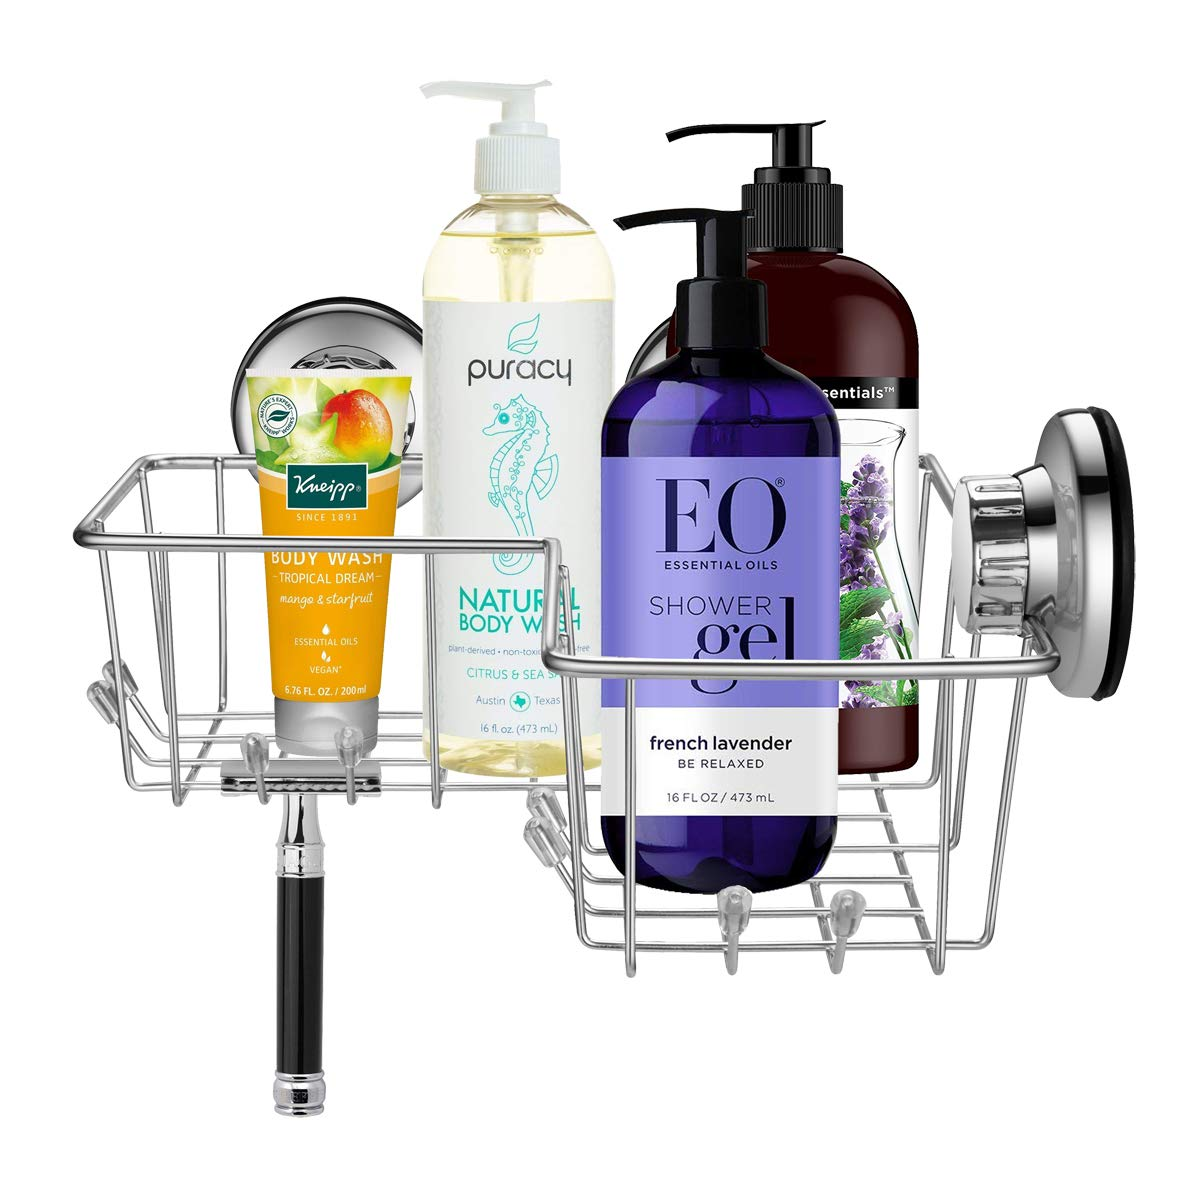 ARCCI Shower Caddy with Suction Cup Corner Basket Shelf with Hooks Shampoo Holder Stainless Steel Bathroom Accesoories for Bathroom & Kitchen - Rustproof (Corner Shower Caddy)